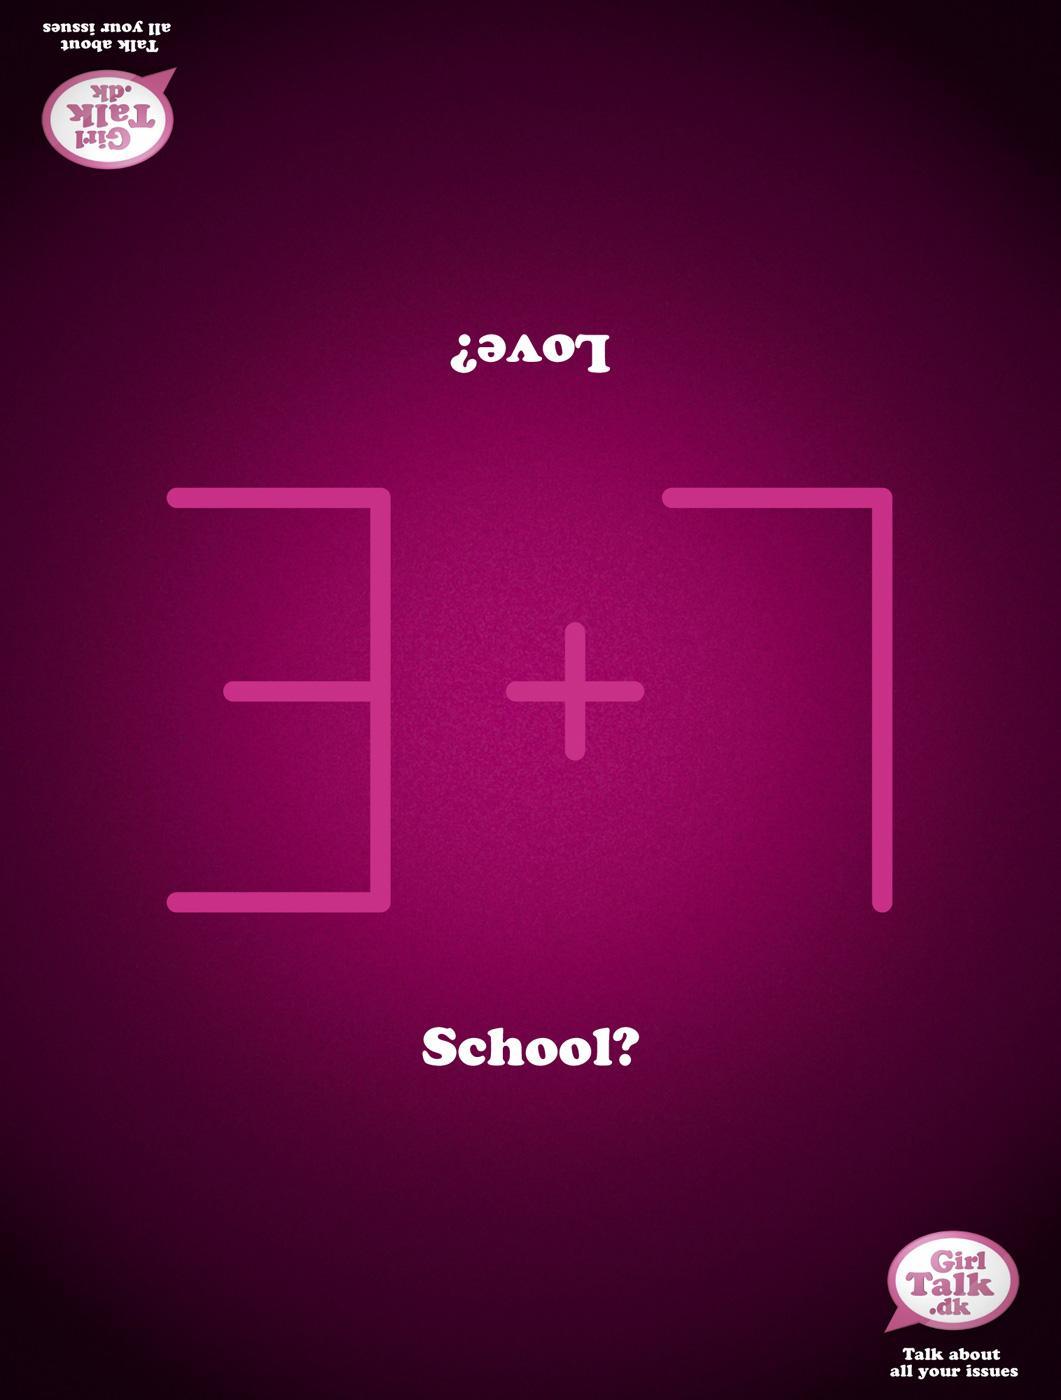 GirlTalk.dk Print Ad -  School? Love?